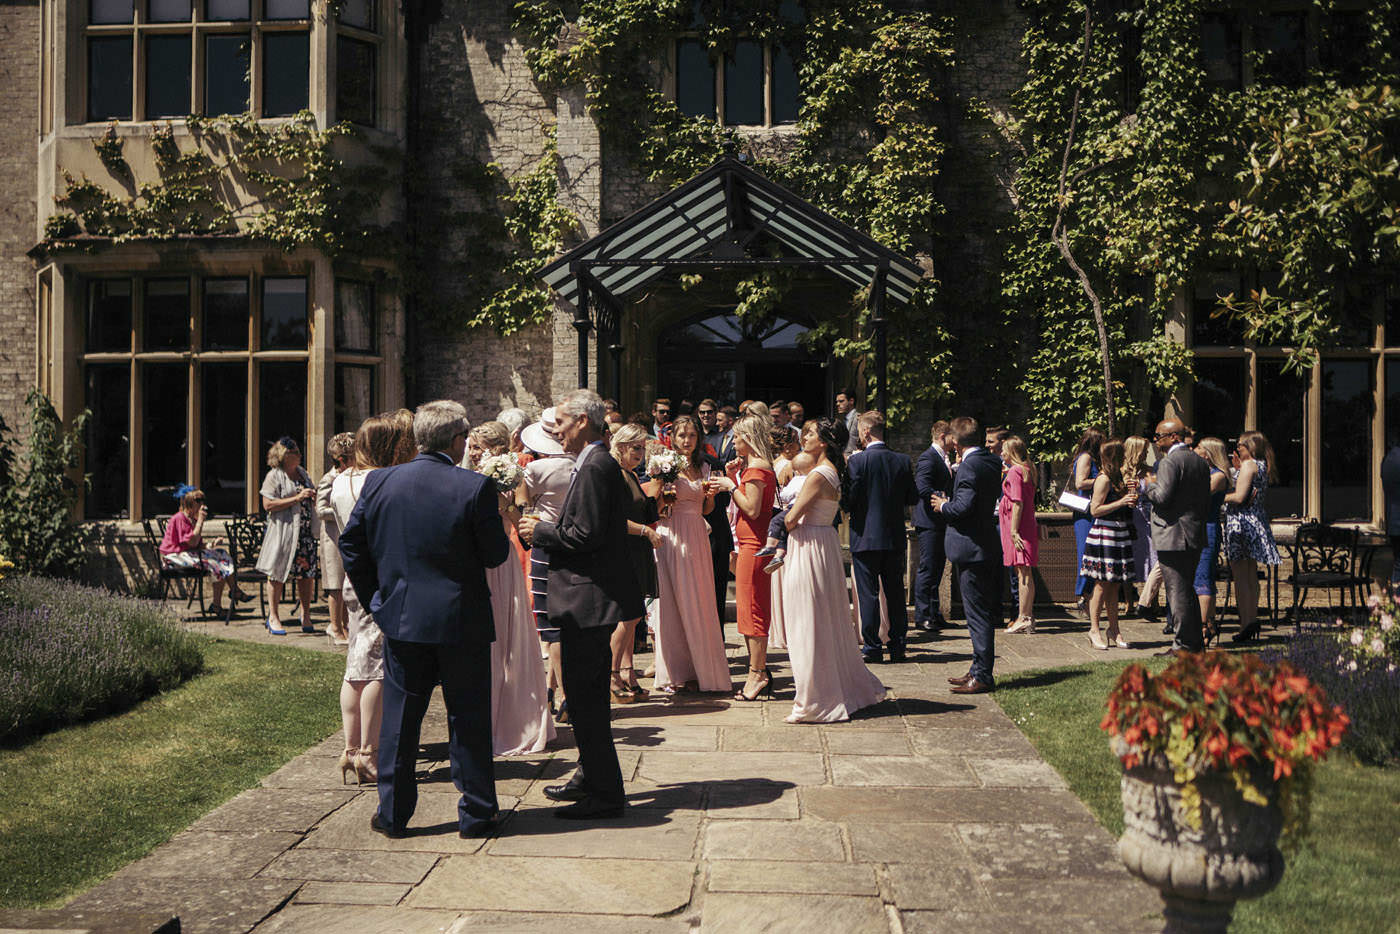 lukeemily foxhills wedding photographer 0058